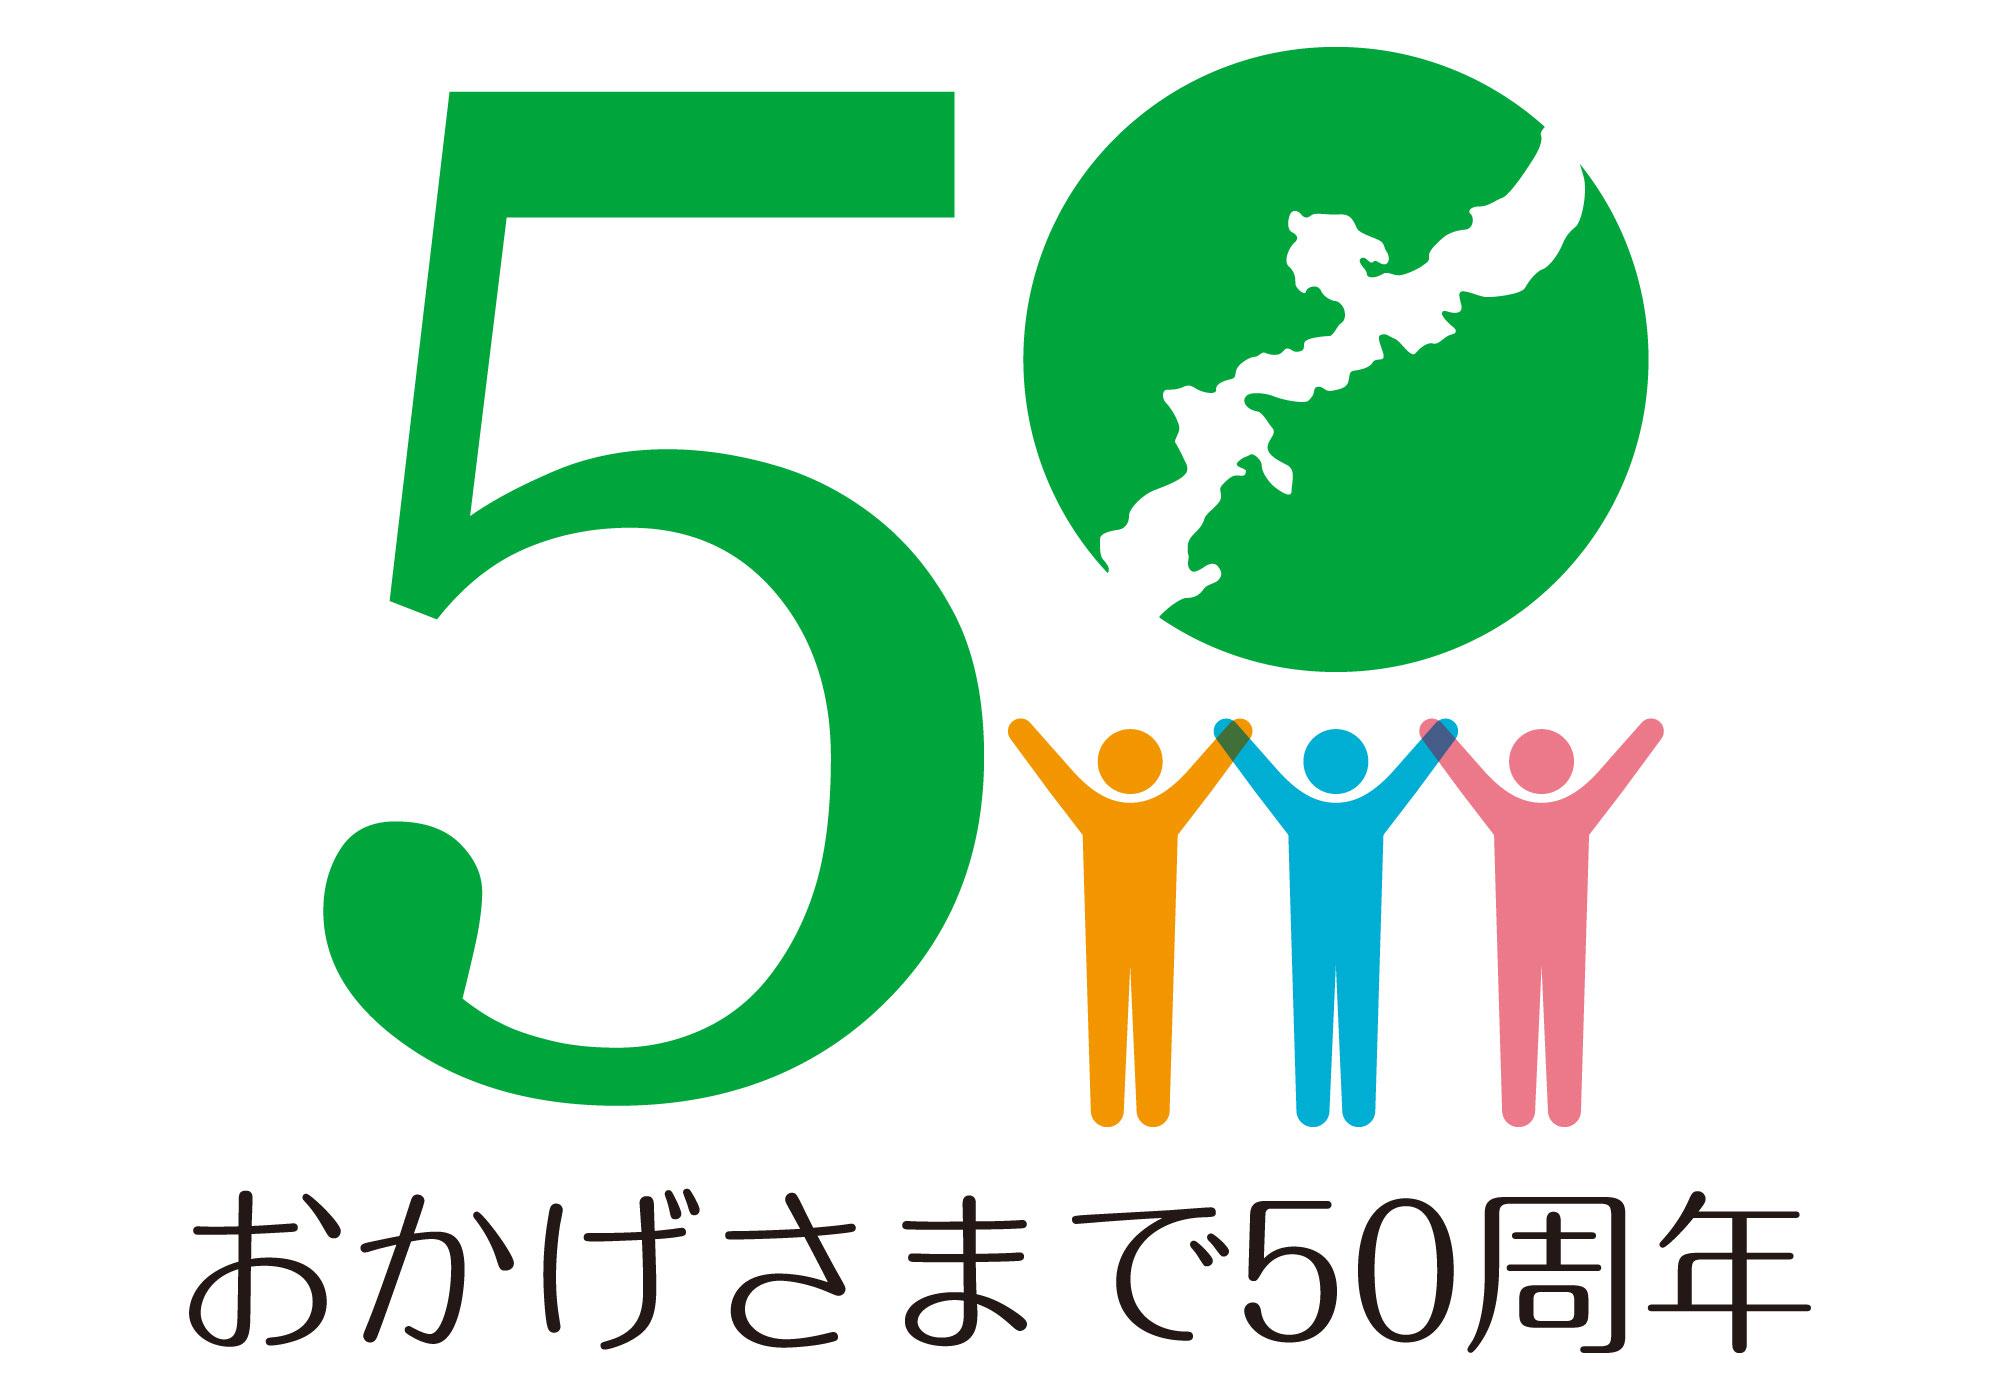 株式会社 琉球光和(50周年ロゴ)